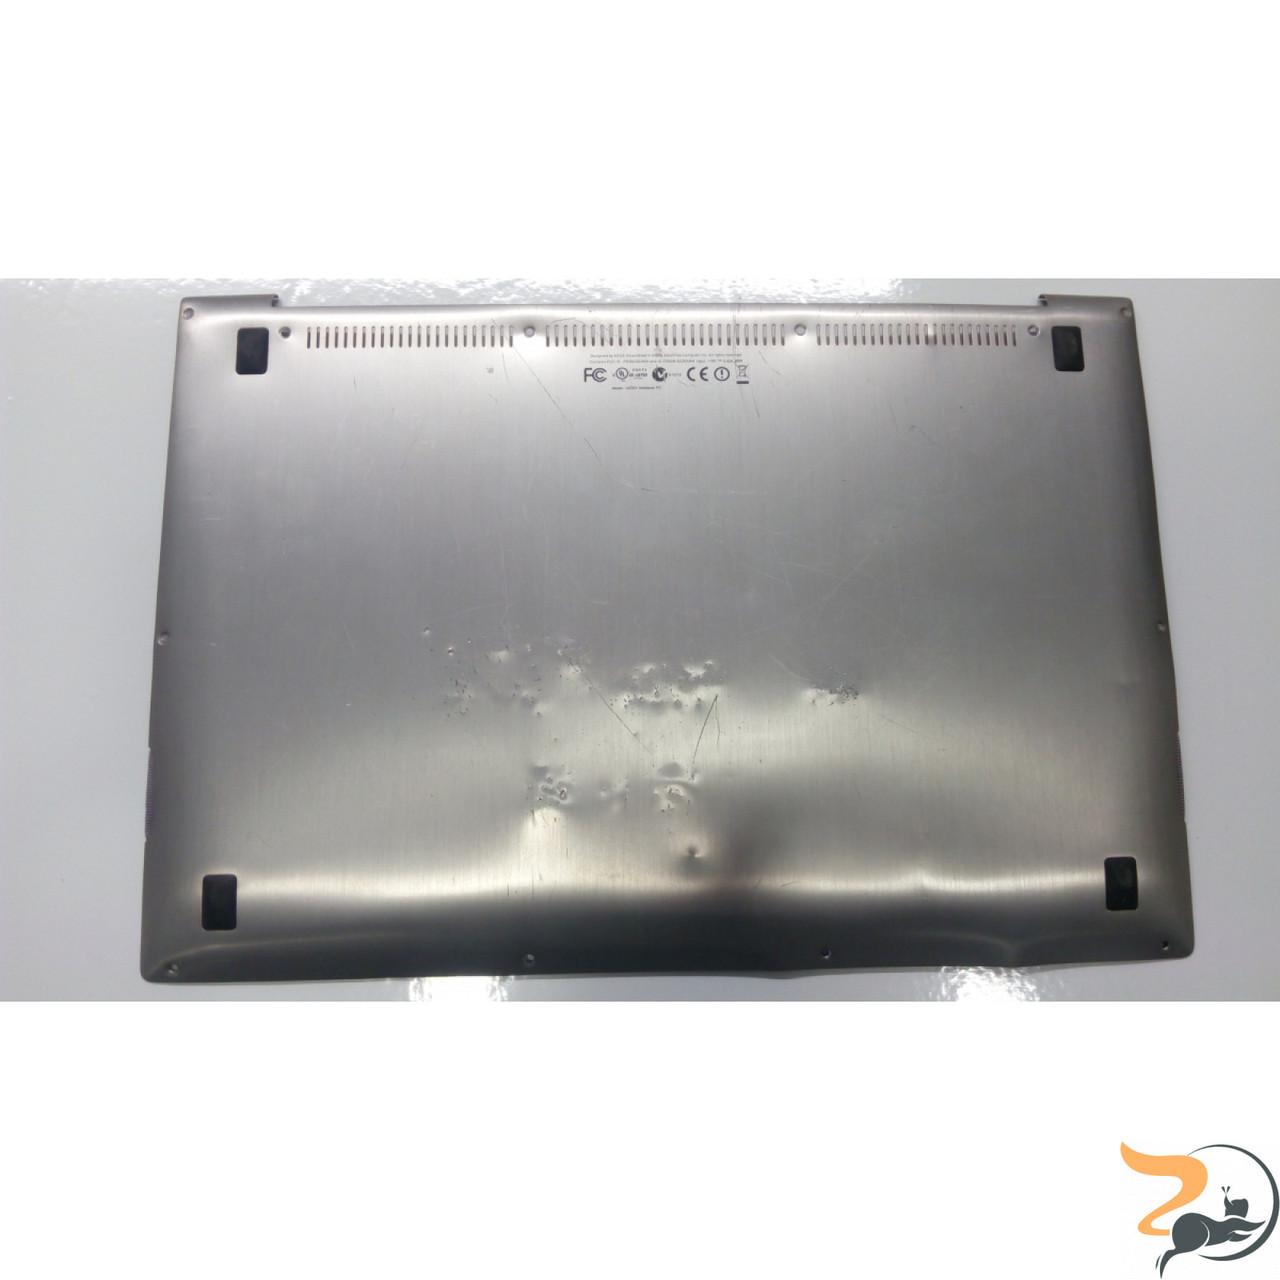 Сервісна кришка для ноутбука ASUS ZenBook UX32VD, 13N0-MYA0601, б/в